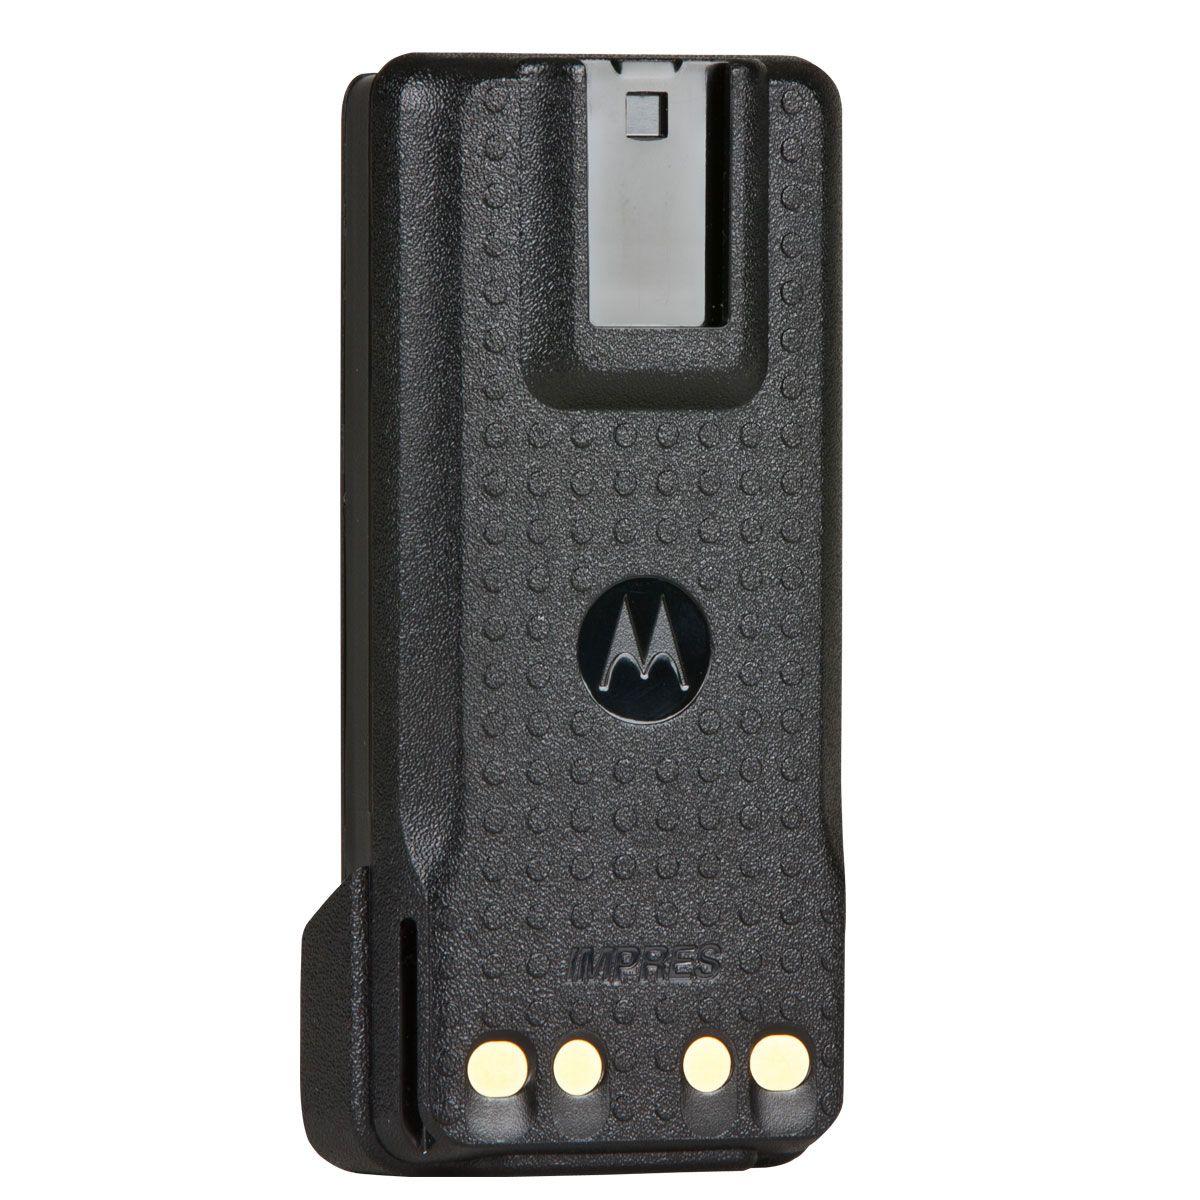 Batería Motorola Li-Ion 2350mAh para radios serie DGP NNTN8129A